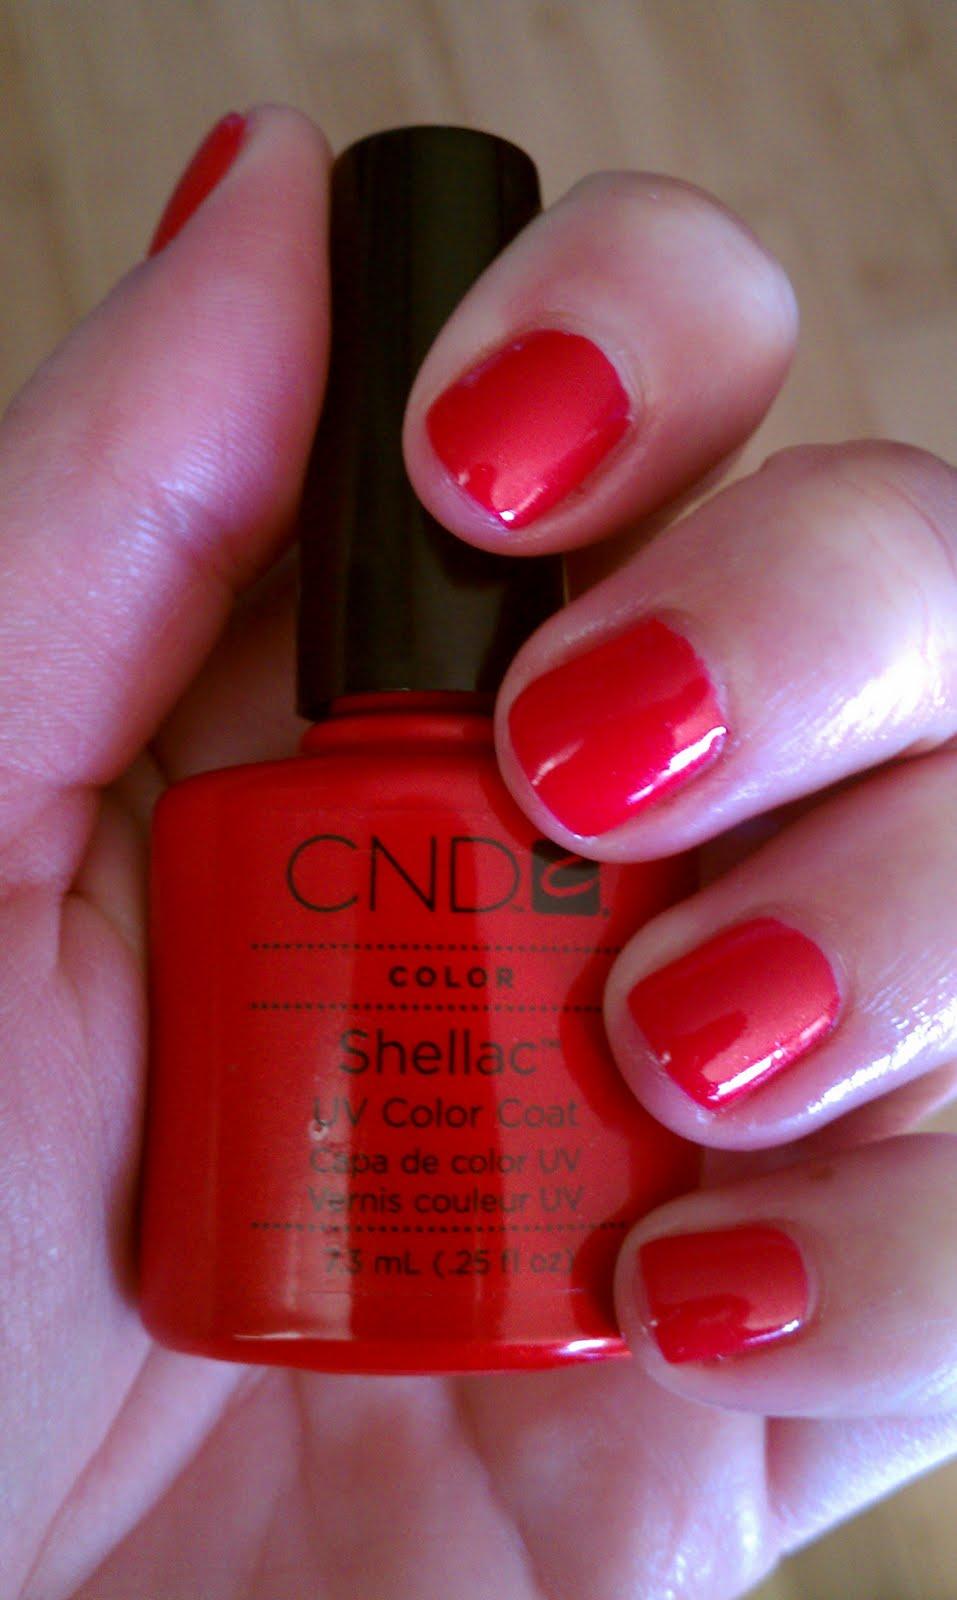 Cnd shellac wildfire фото на ногтях